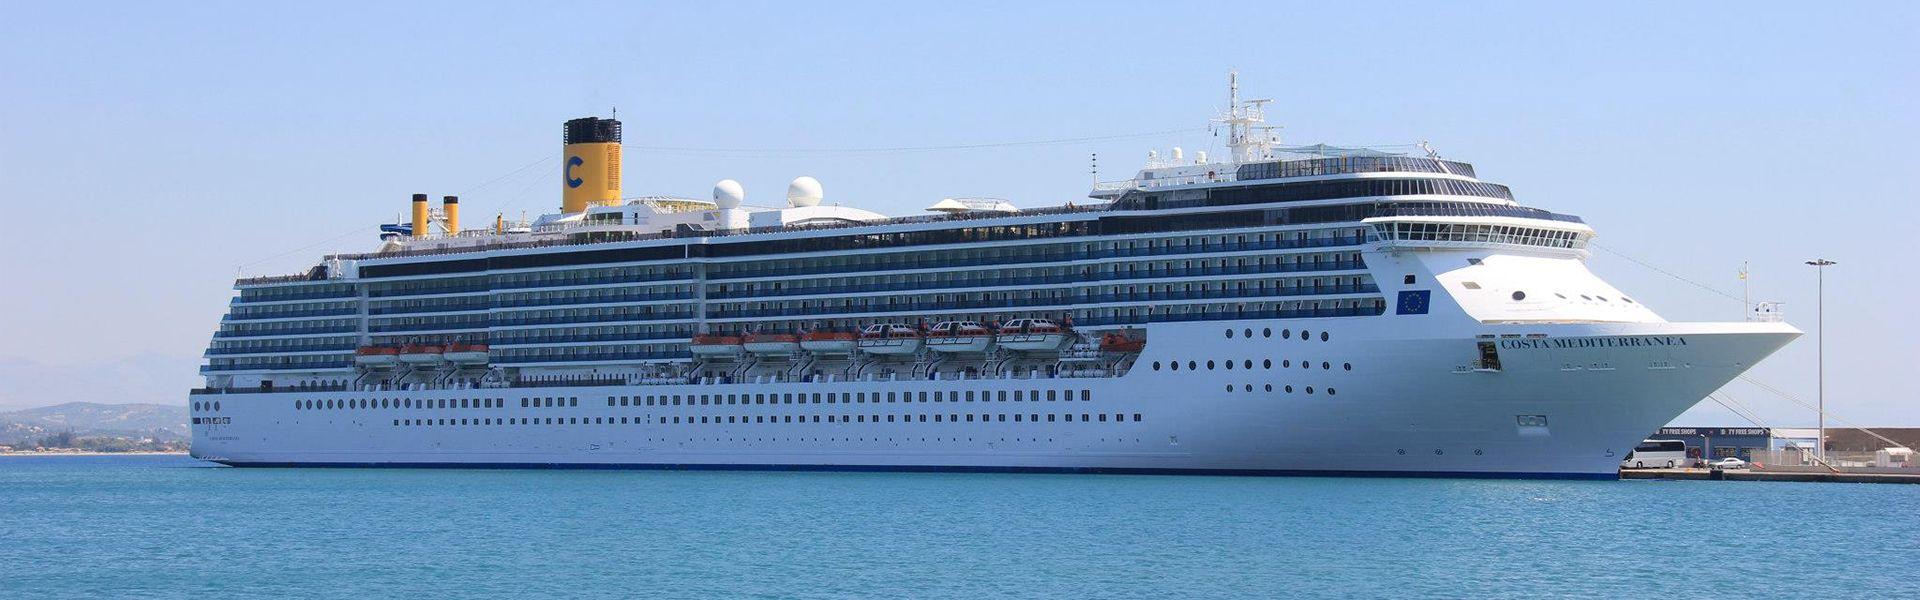 Croaziera 2017 - Mediterana de Vest (Marsilia) - Costa Cruises - Costa Mediterranea - 7 nopti